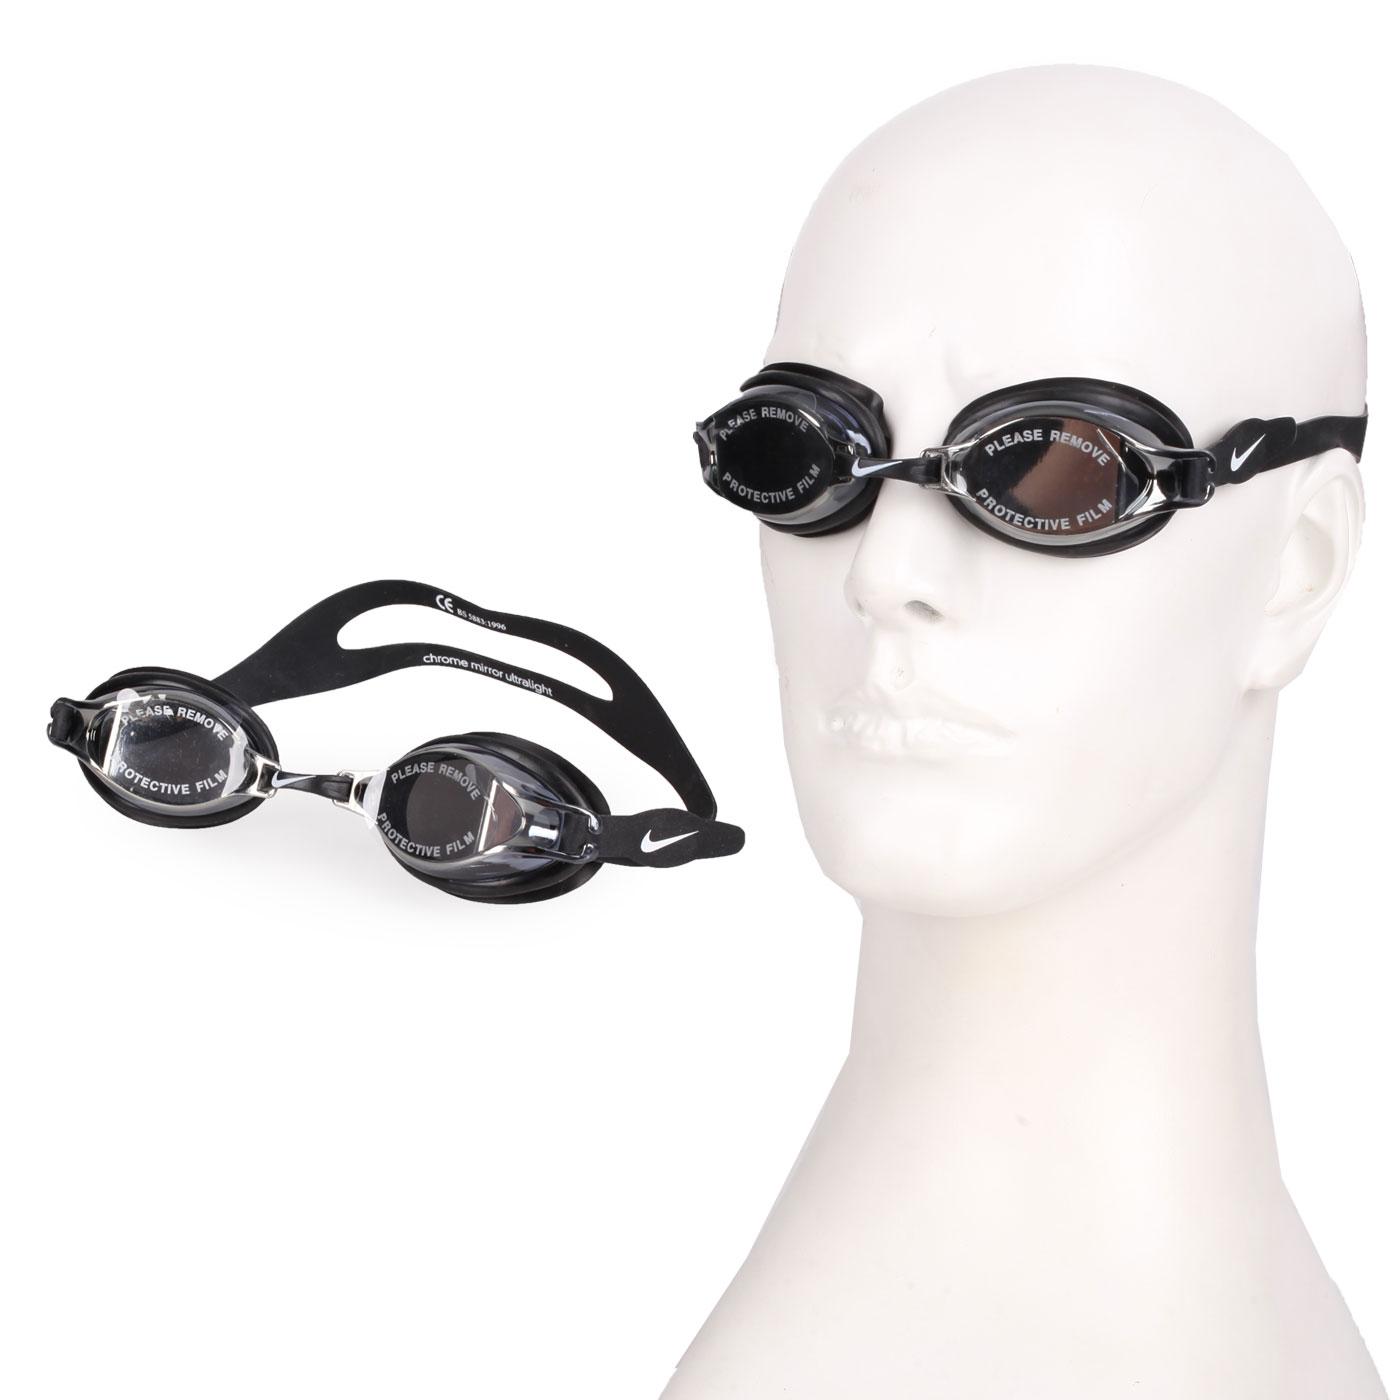 NIKE SWIM 訓練型成人泳鏡 NESS7152-001